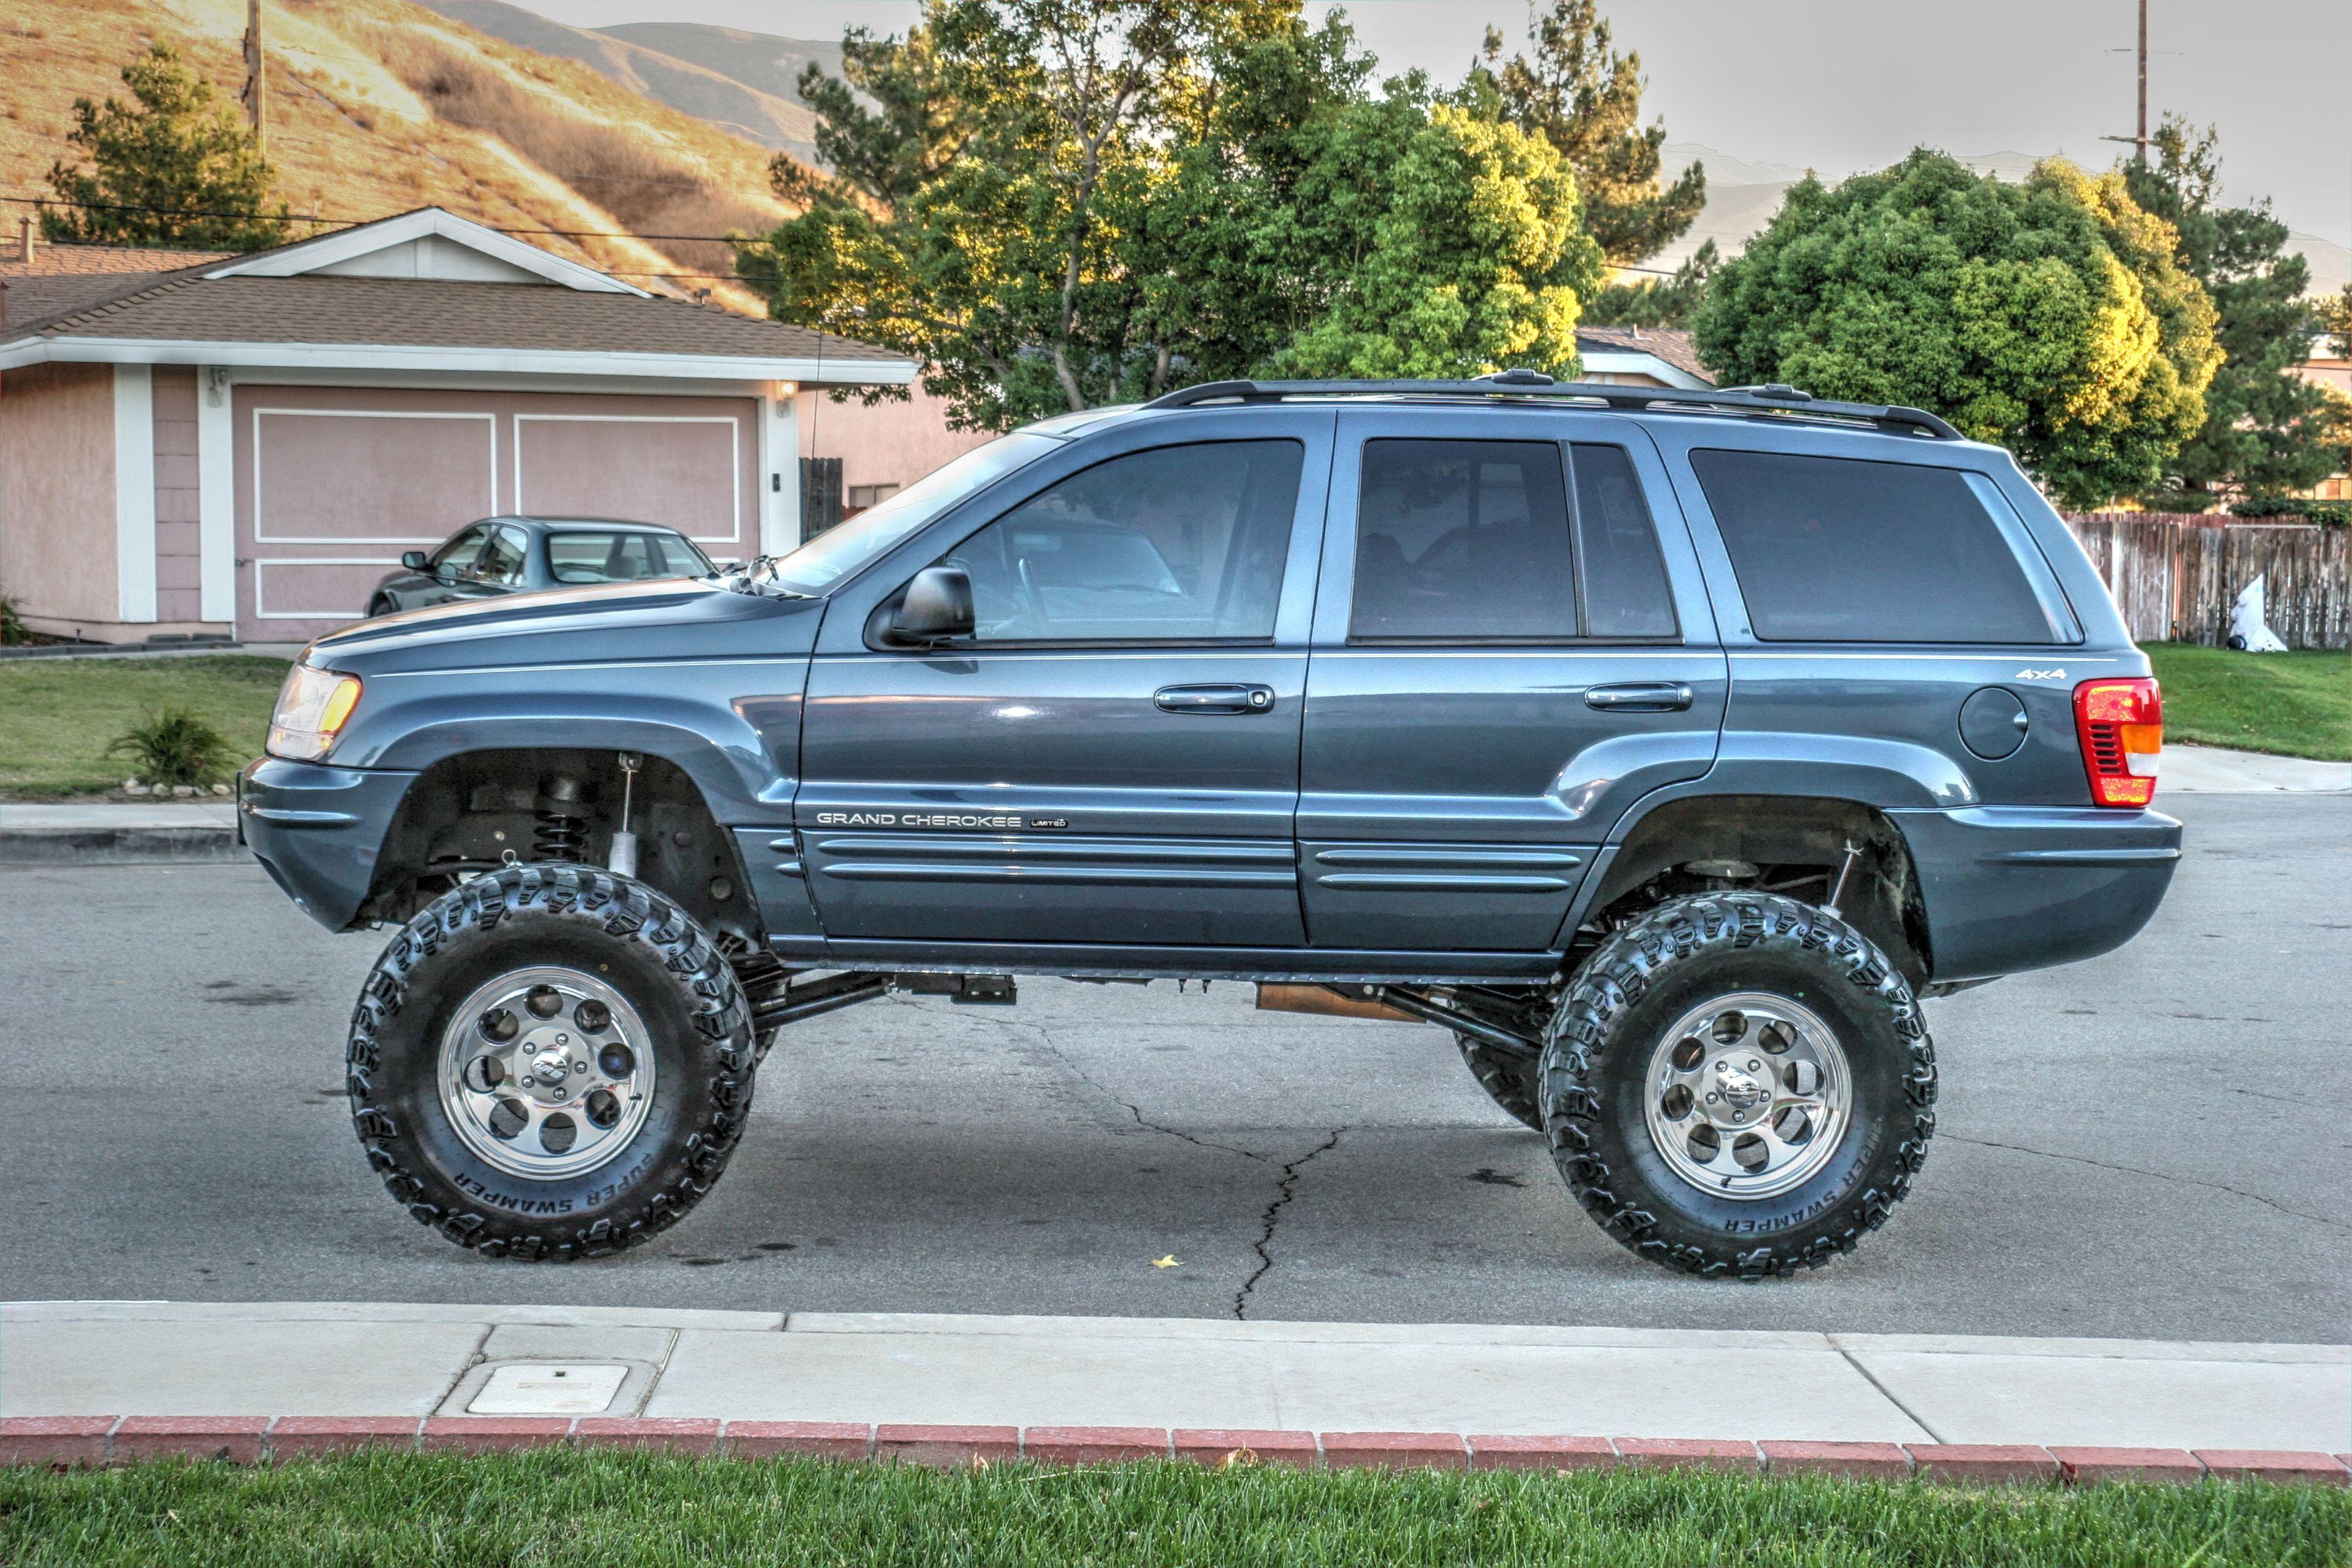 2000 jeep grand cherokee wj rockkrawler 6 5 lift 2. Black Bedroom Furniture Sets. Home Design Ideas